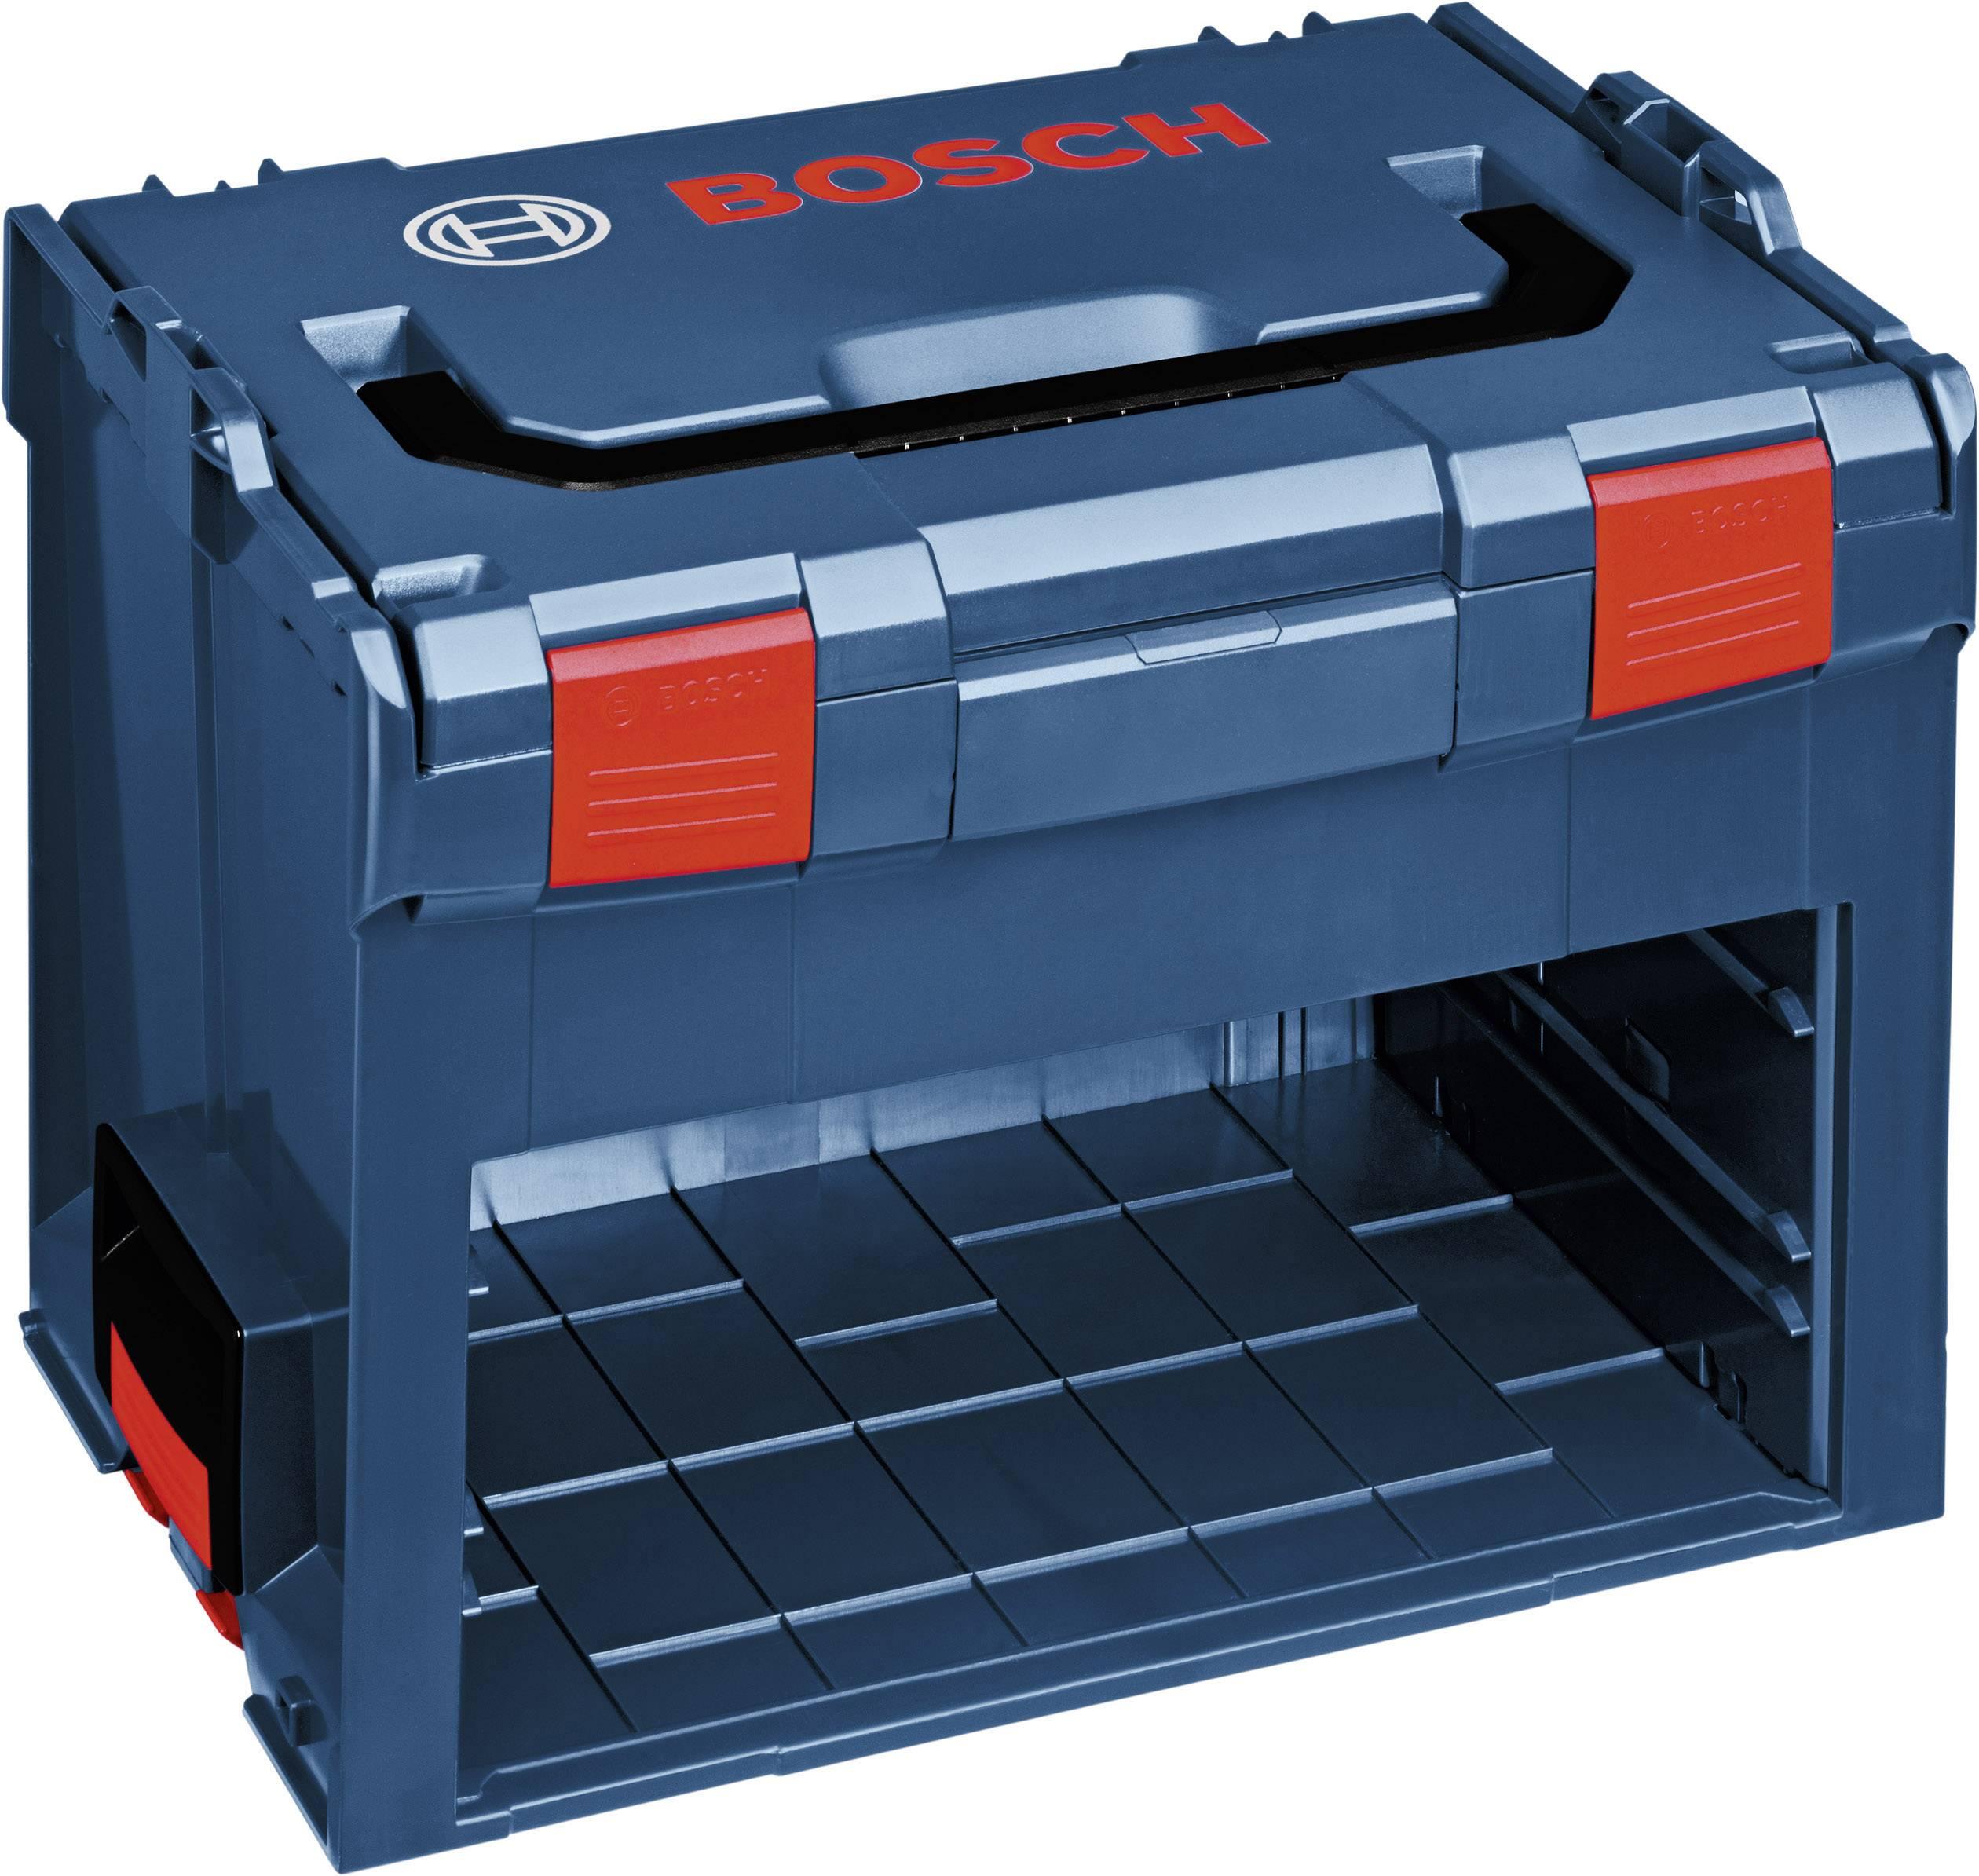 Kufrový systém Bosch L-BOXX 374 Professional 1600A001RU, 357 x 442 x 273 mm, ABS